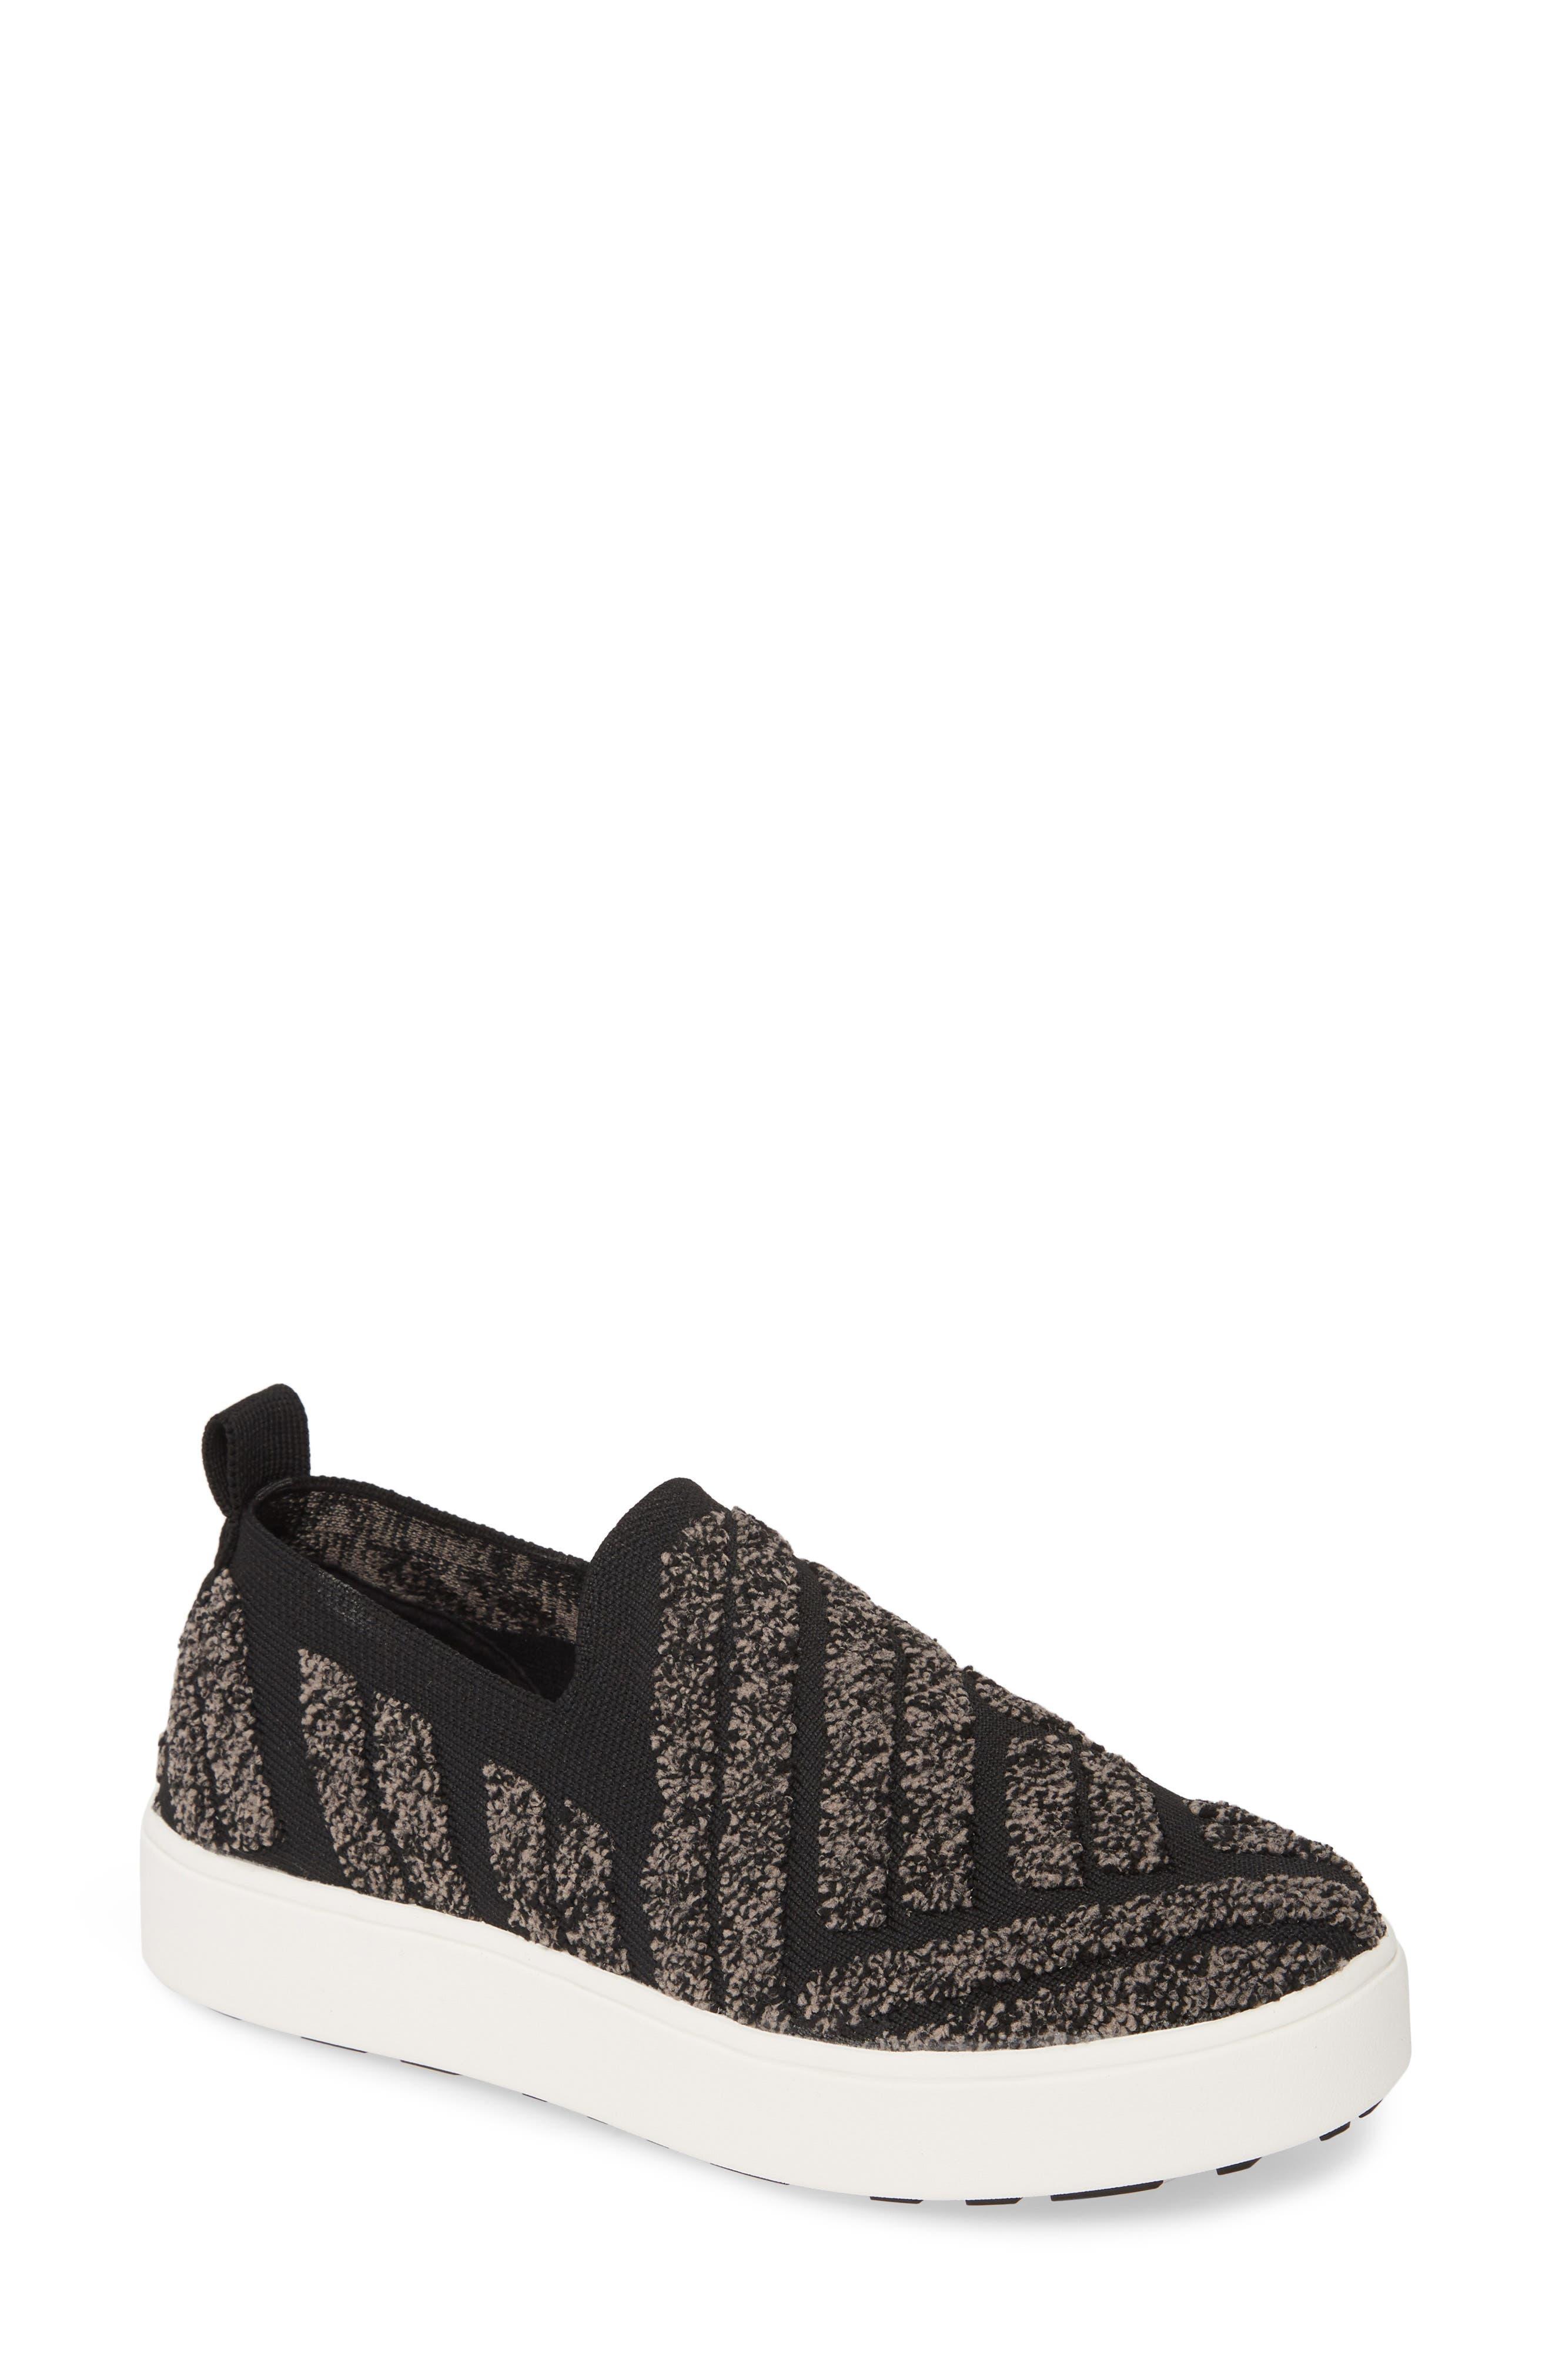 Bernie Mev. Emma Slip-On Sneaker